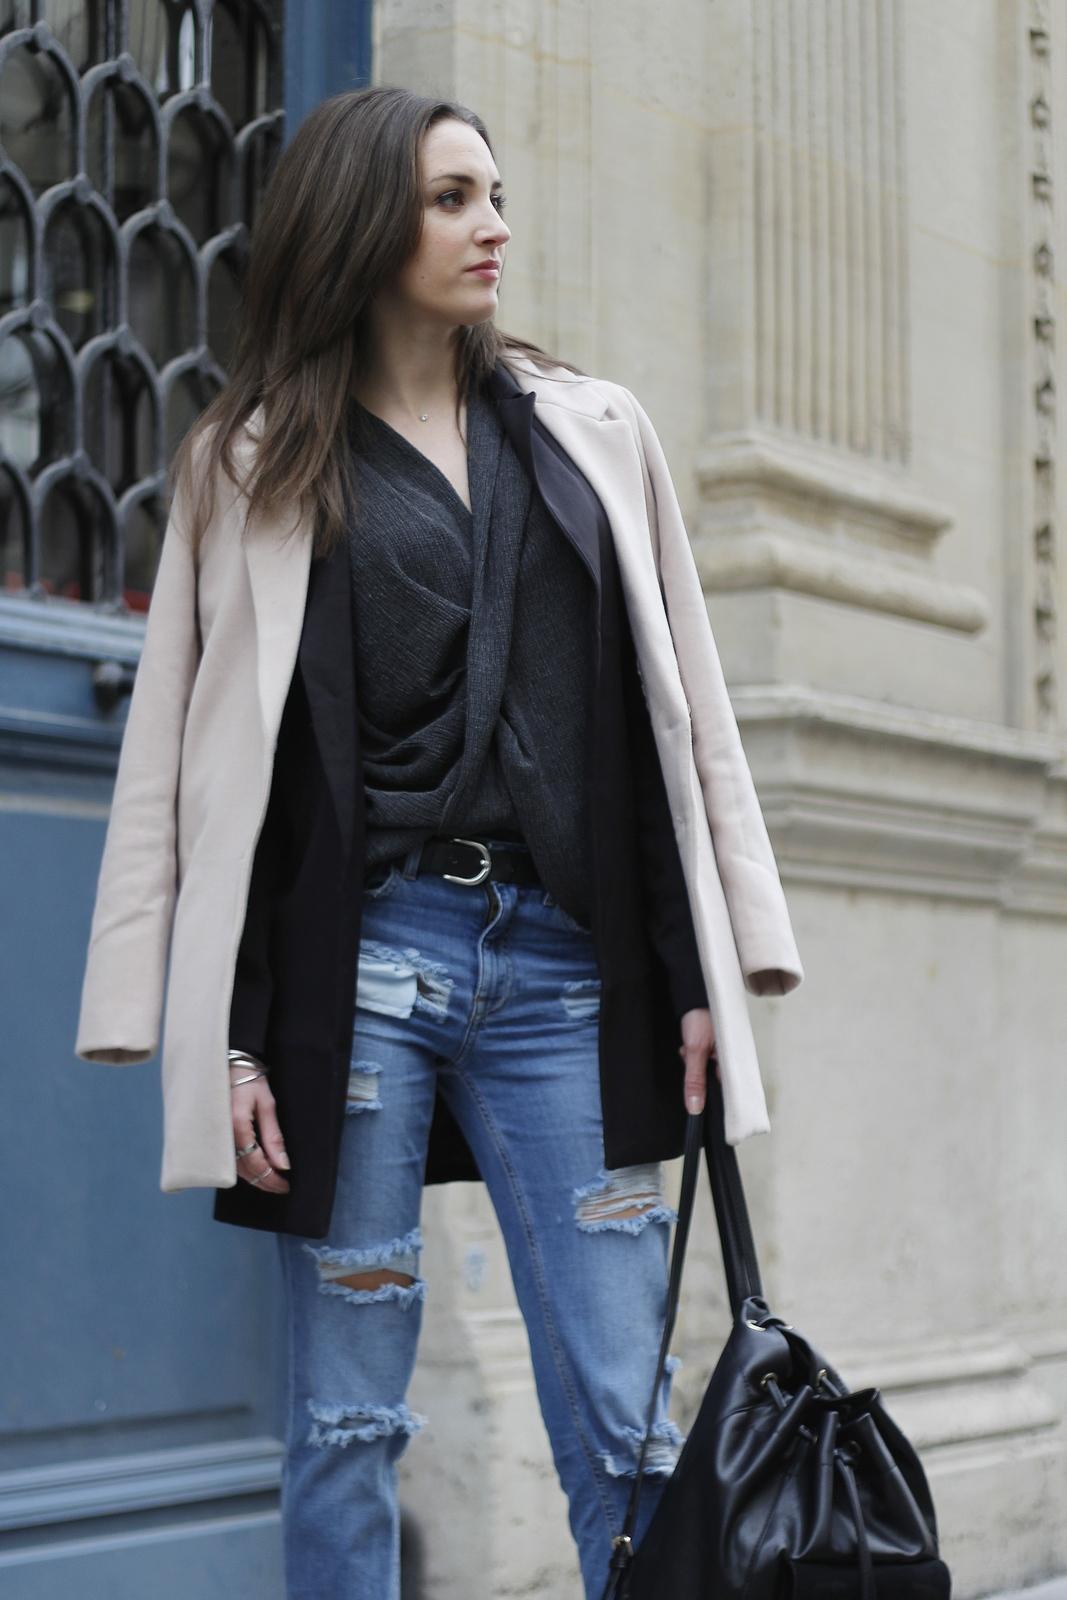 Blog mode femme Paris - Du style, Madame - Streetstyle - layering